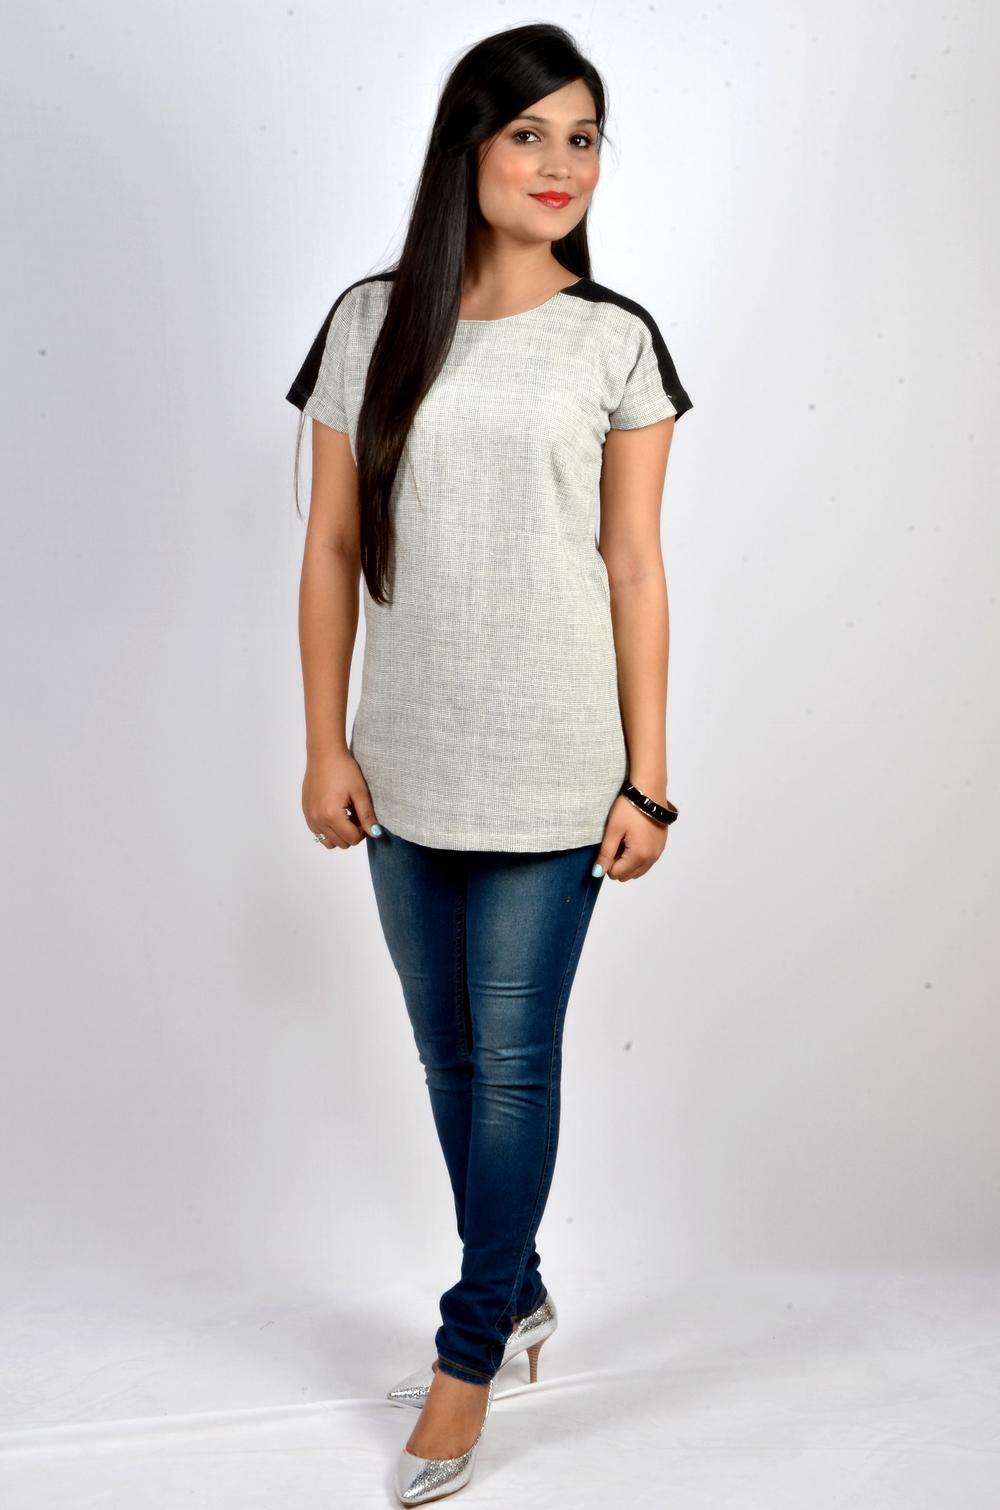 REVIVAL Style's gingam kala blouse